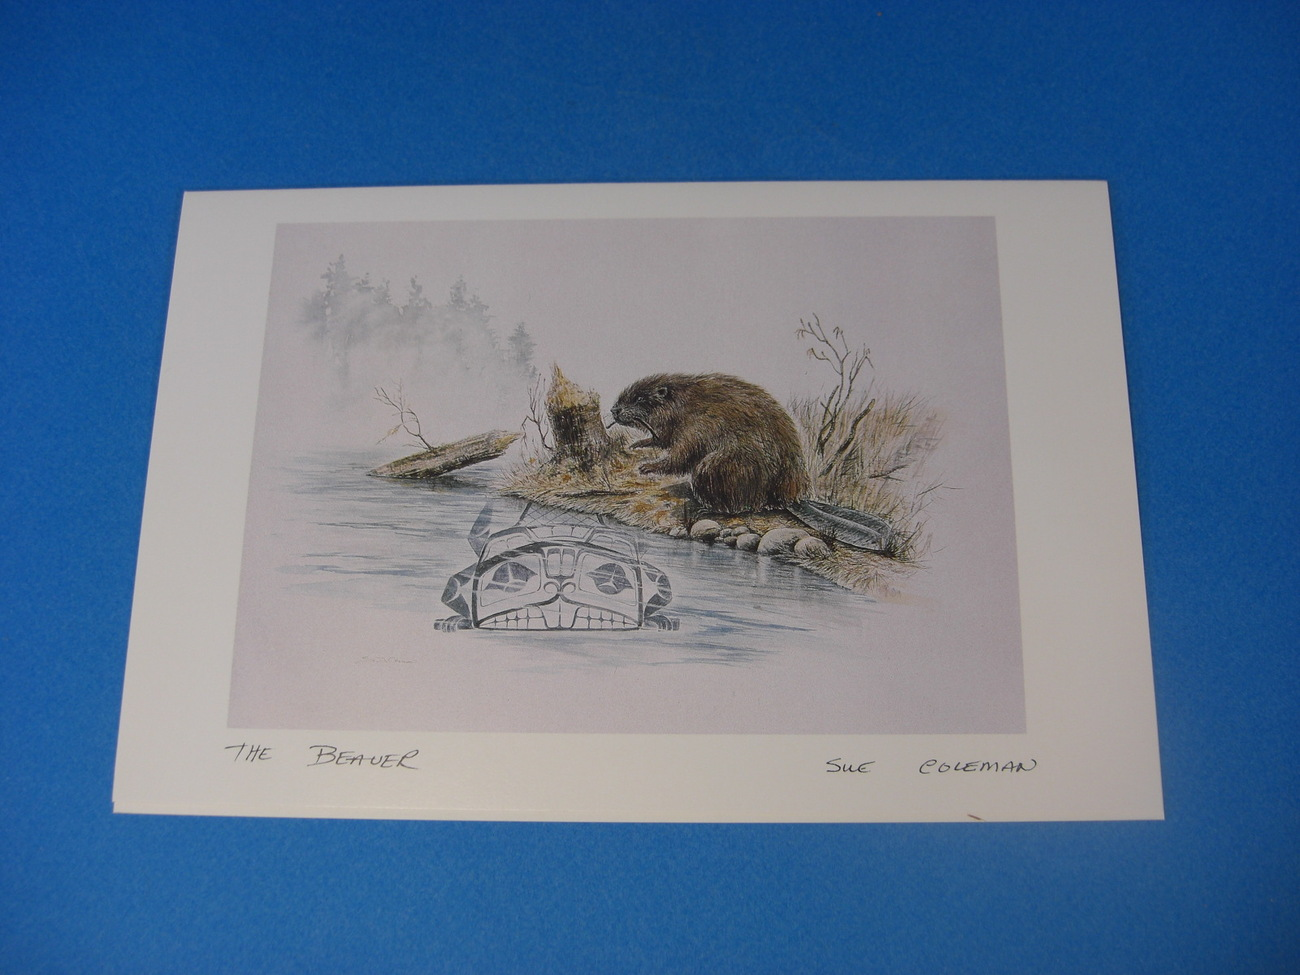 THE BEAVER Art Card by Susan Coleman